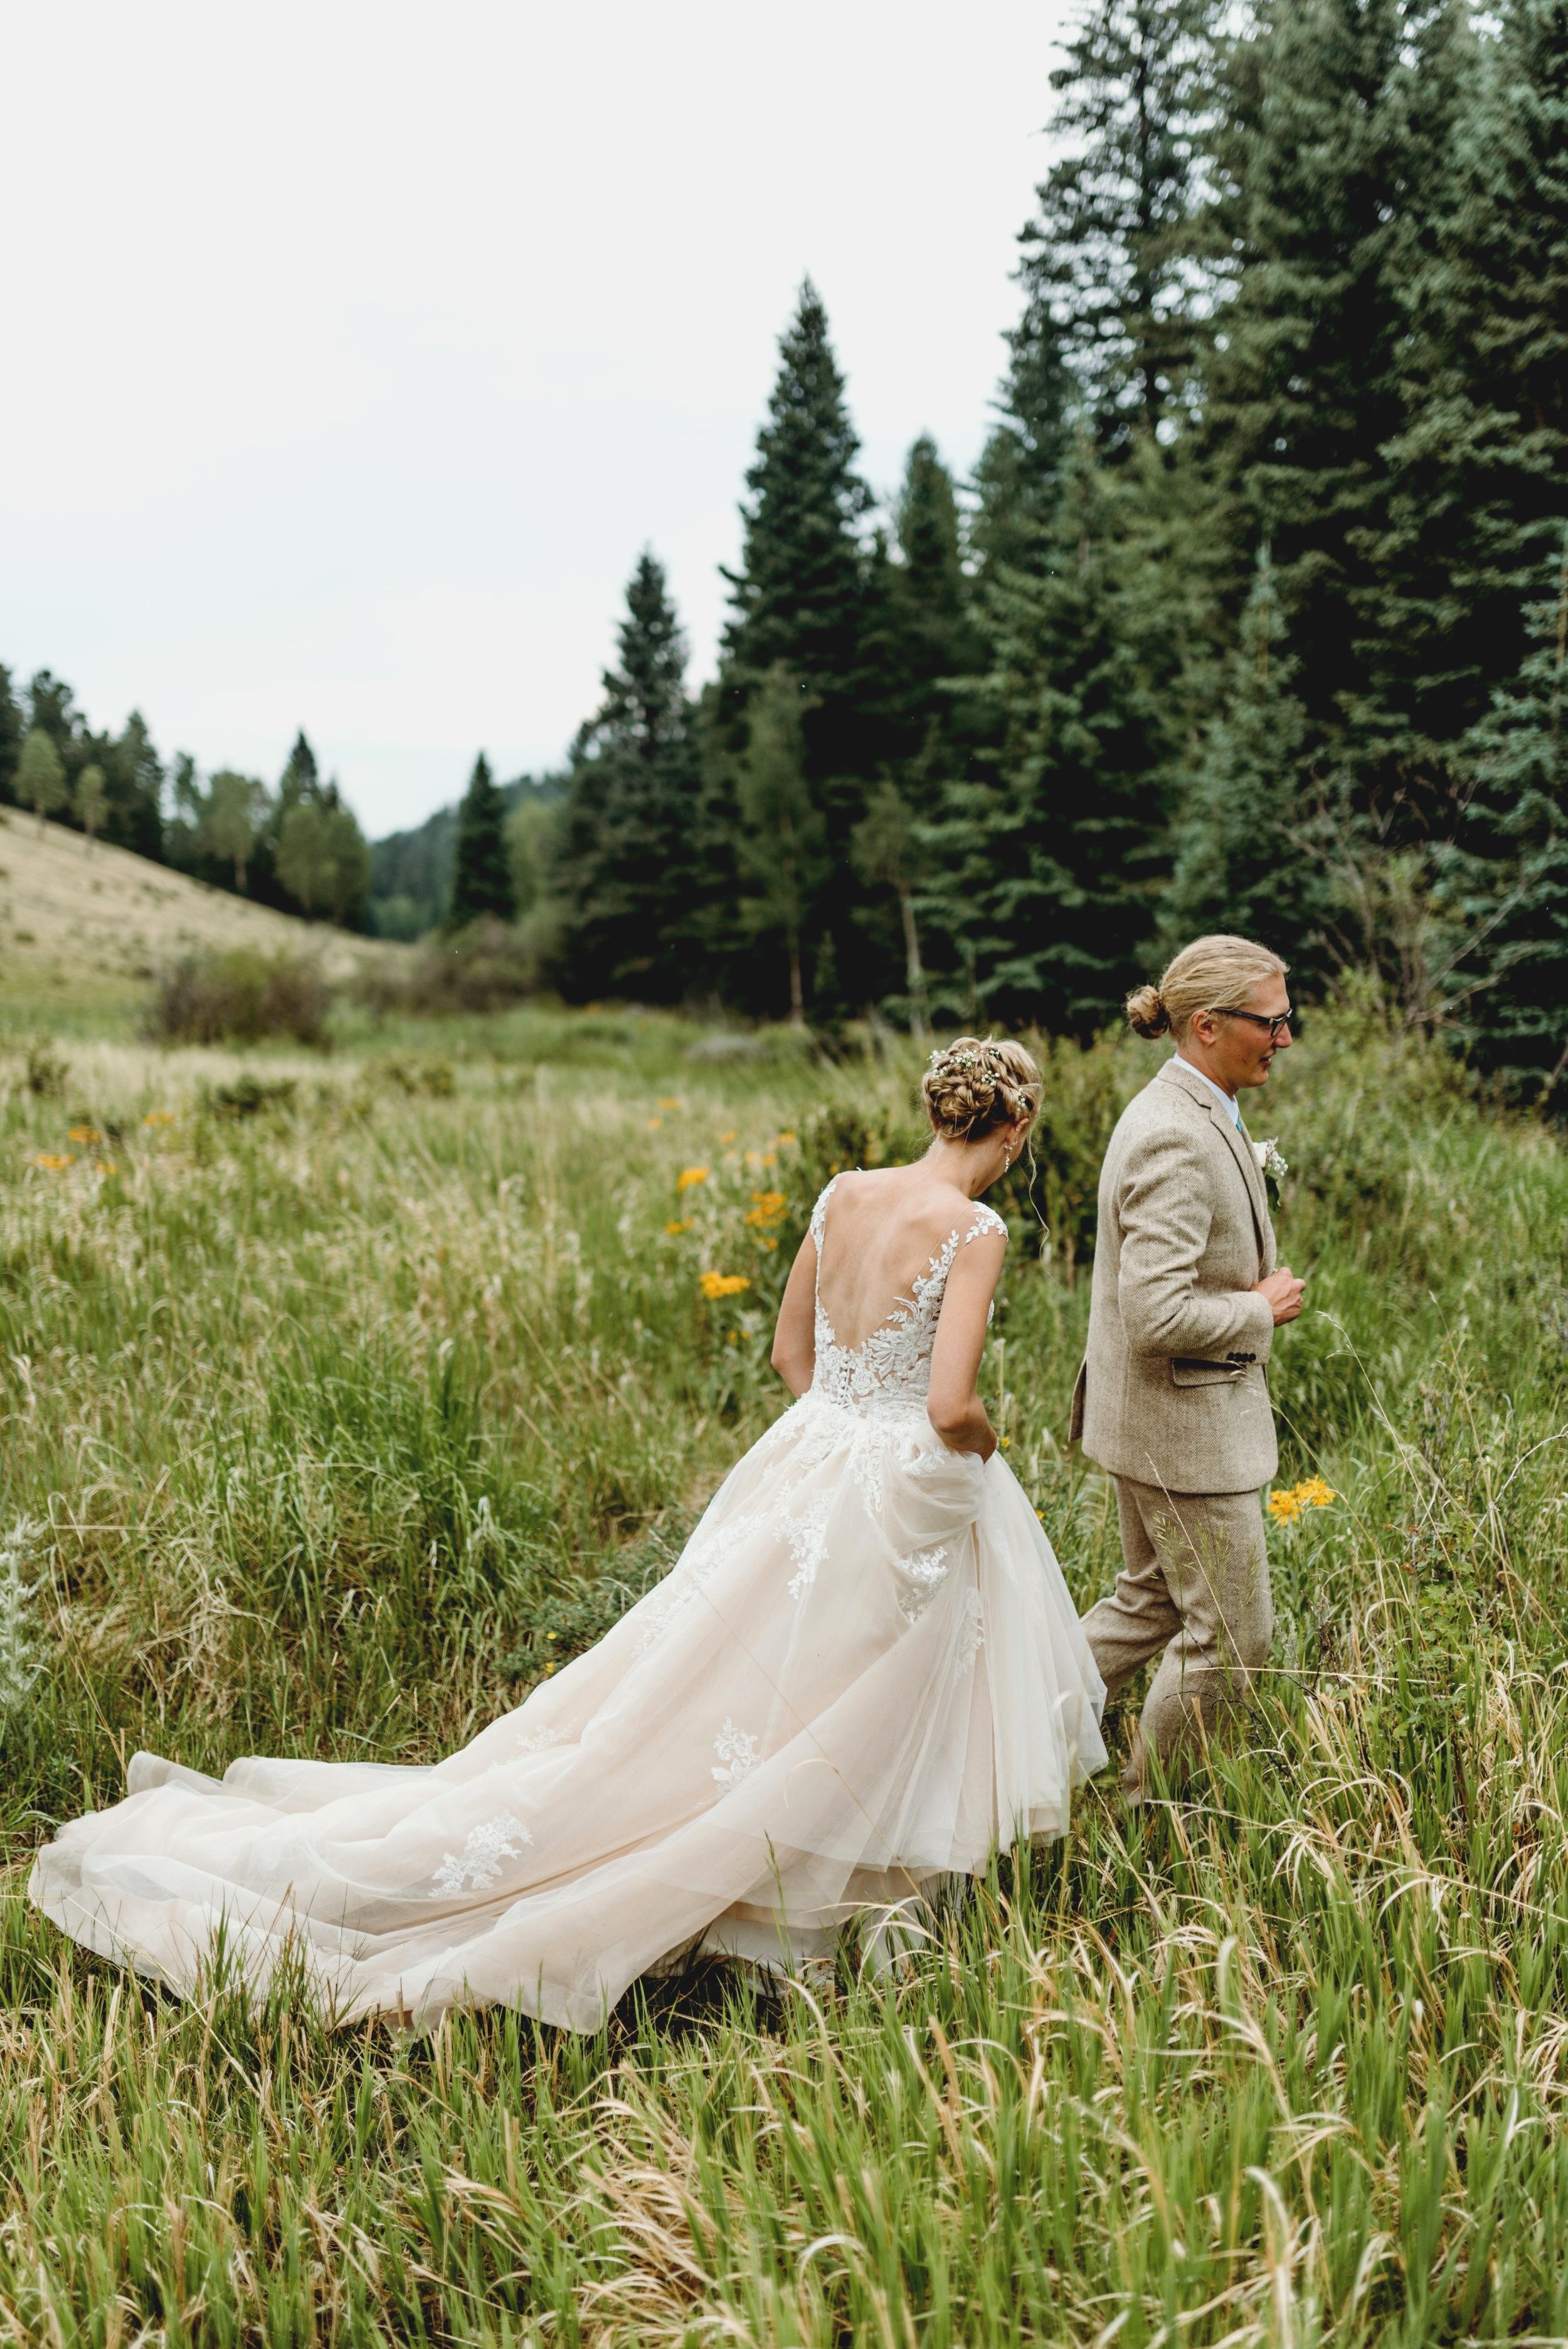 RUSTIC COLORADO MOUNTAIN WEDDING